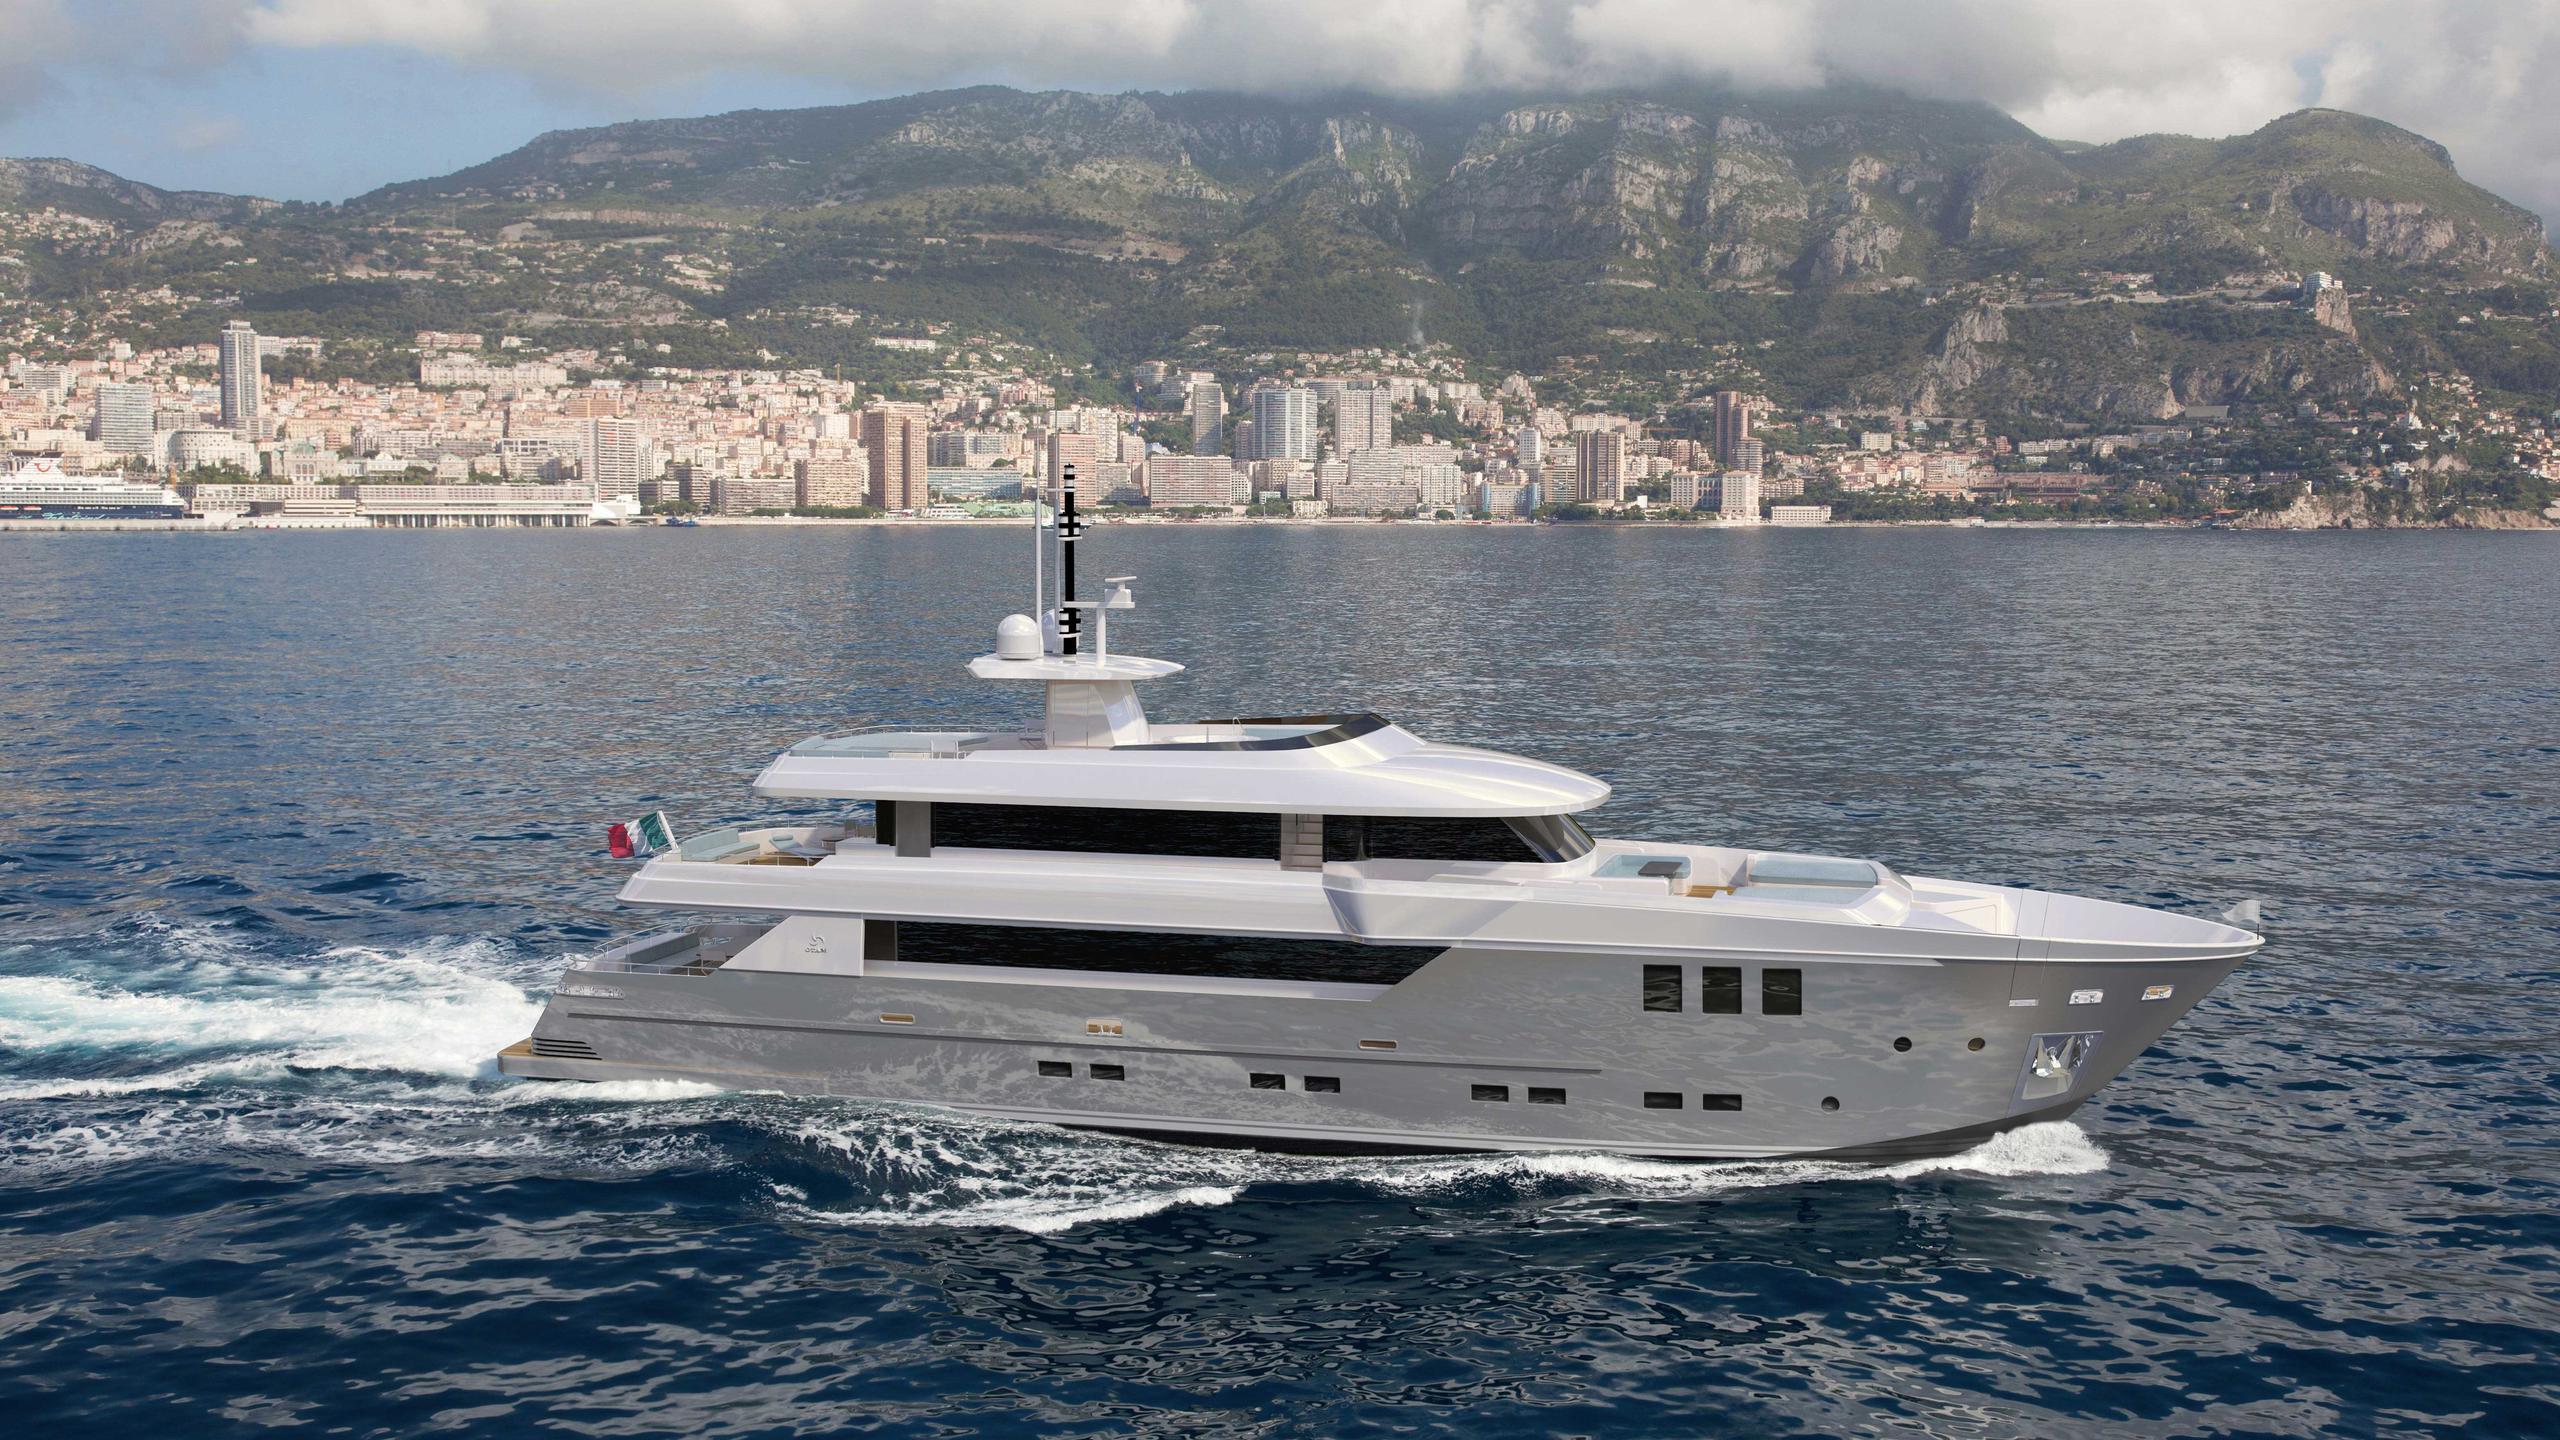 gipsy-motor-yacht-otam-2016-35m-cruising-profile